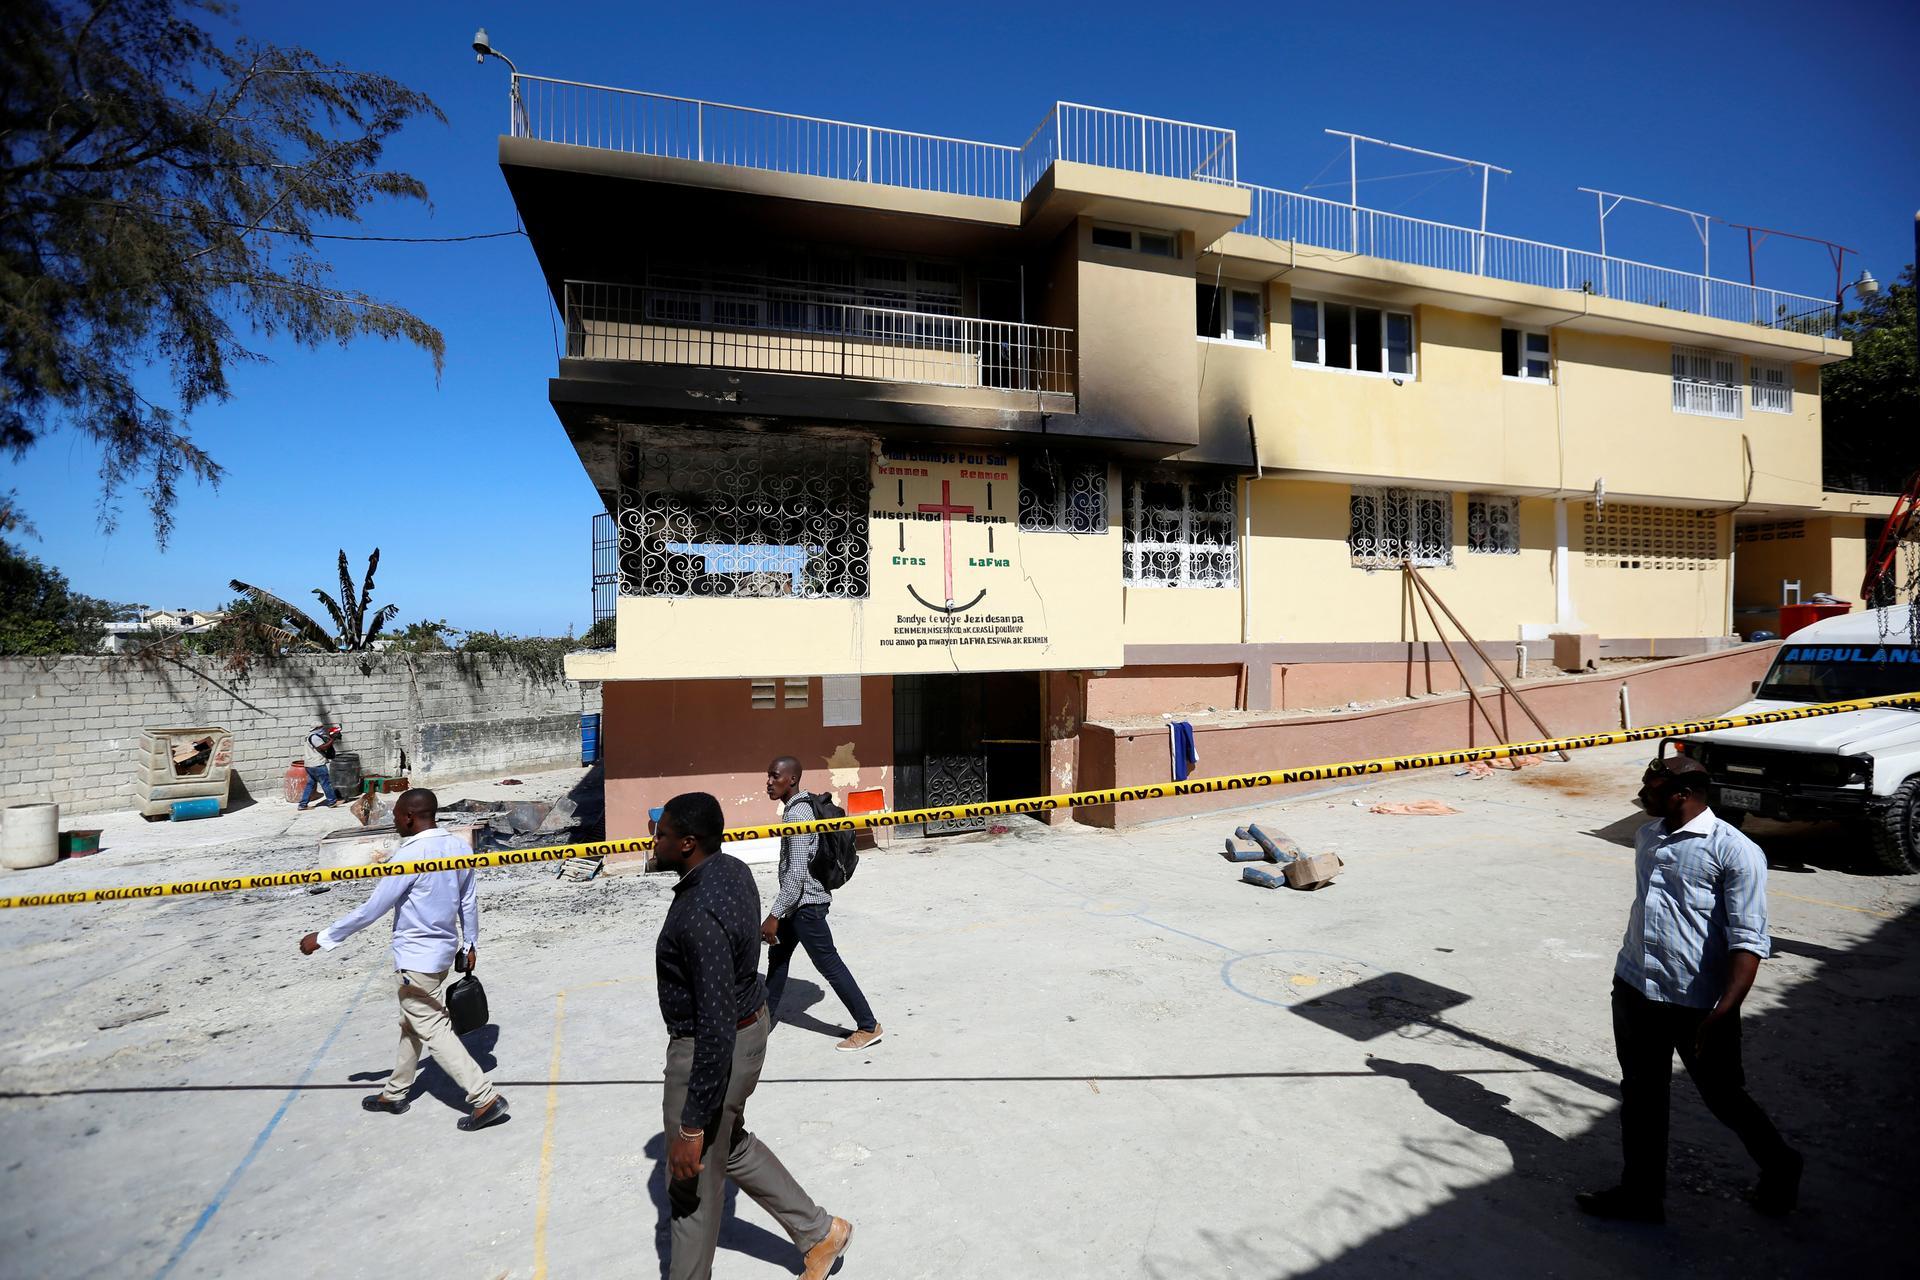 Haiti orphanage fire kills 15, renews debate over unlicensed orphanages